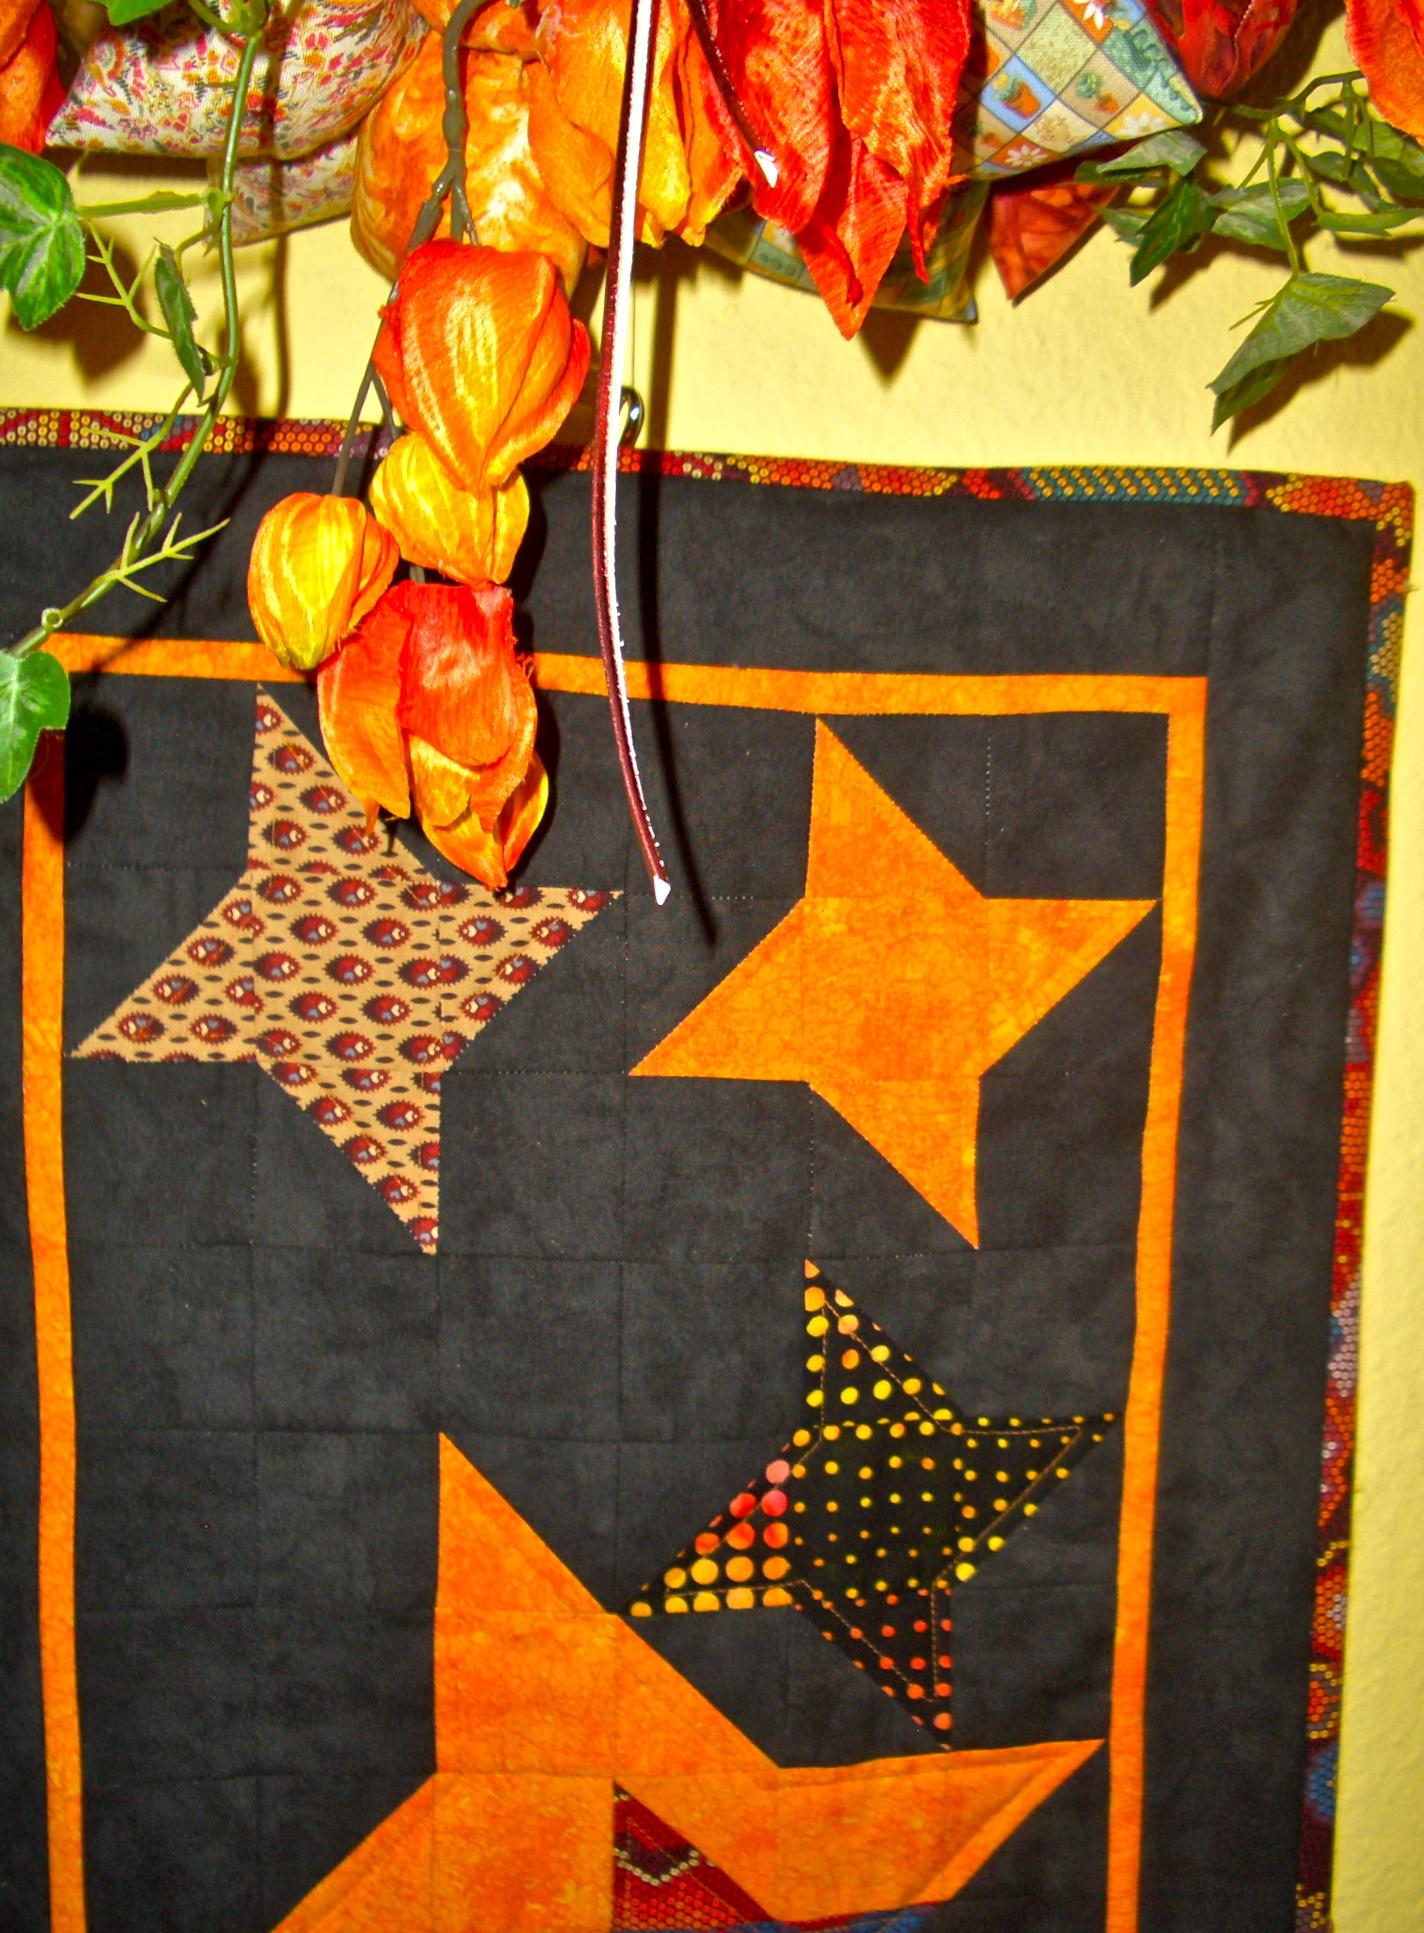 advent weihnachten patchwork manufaktur. Black Bedroom Furniture Sets. Home Design Ideas